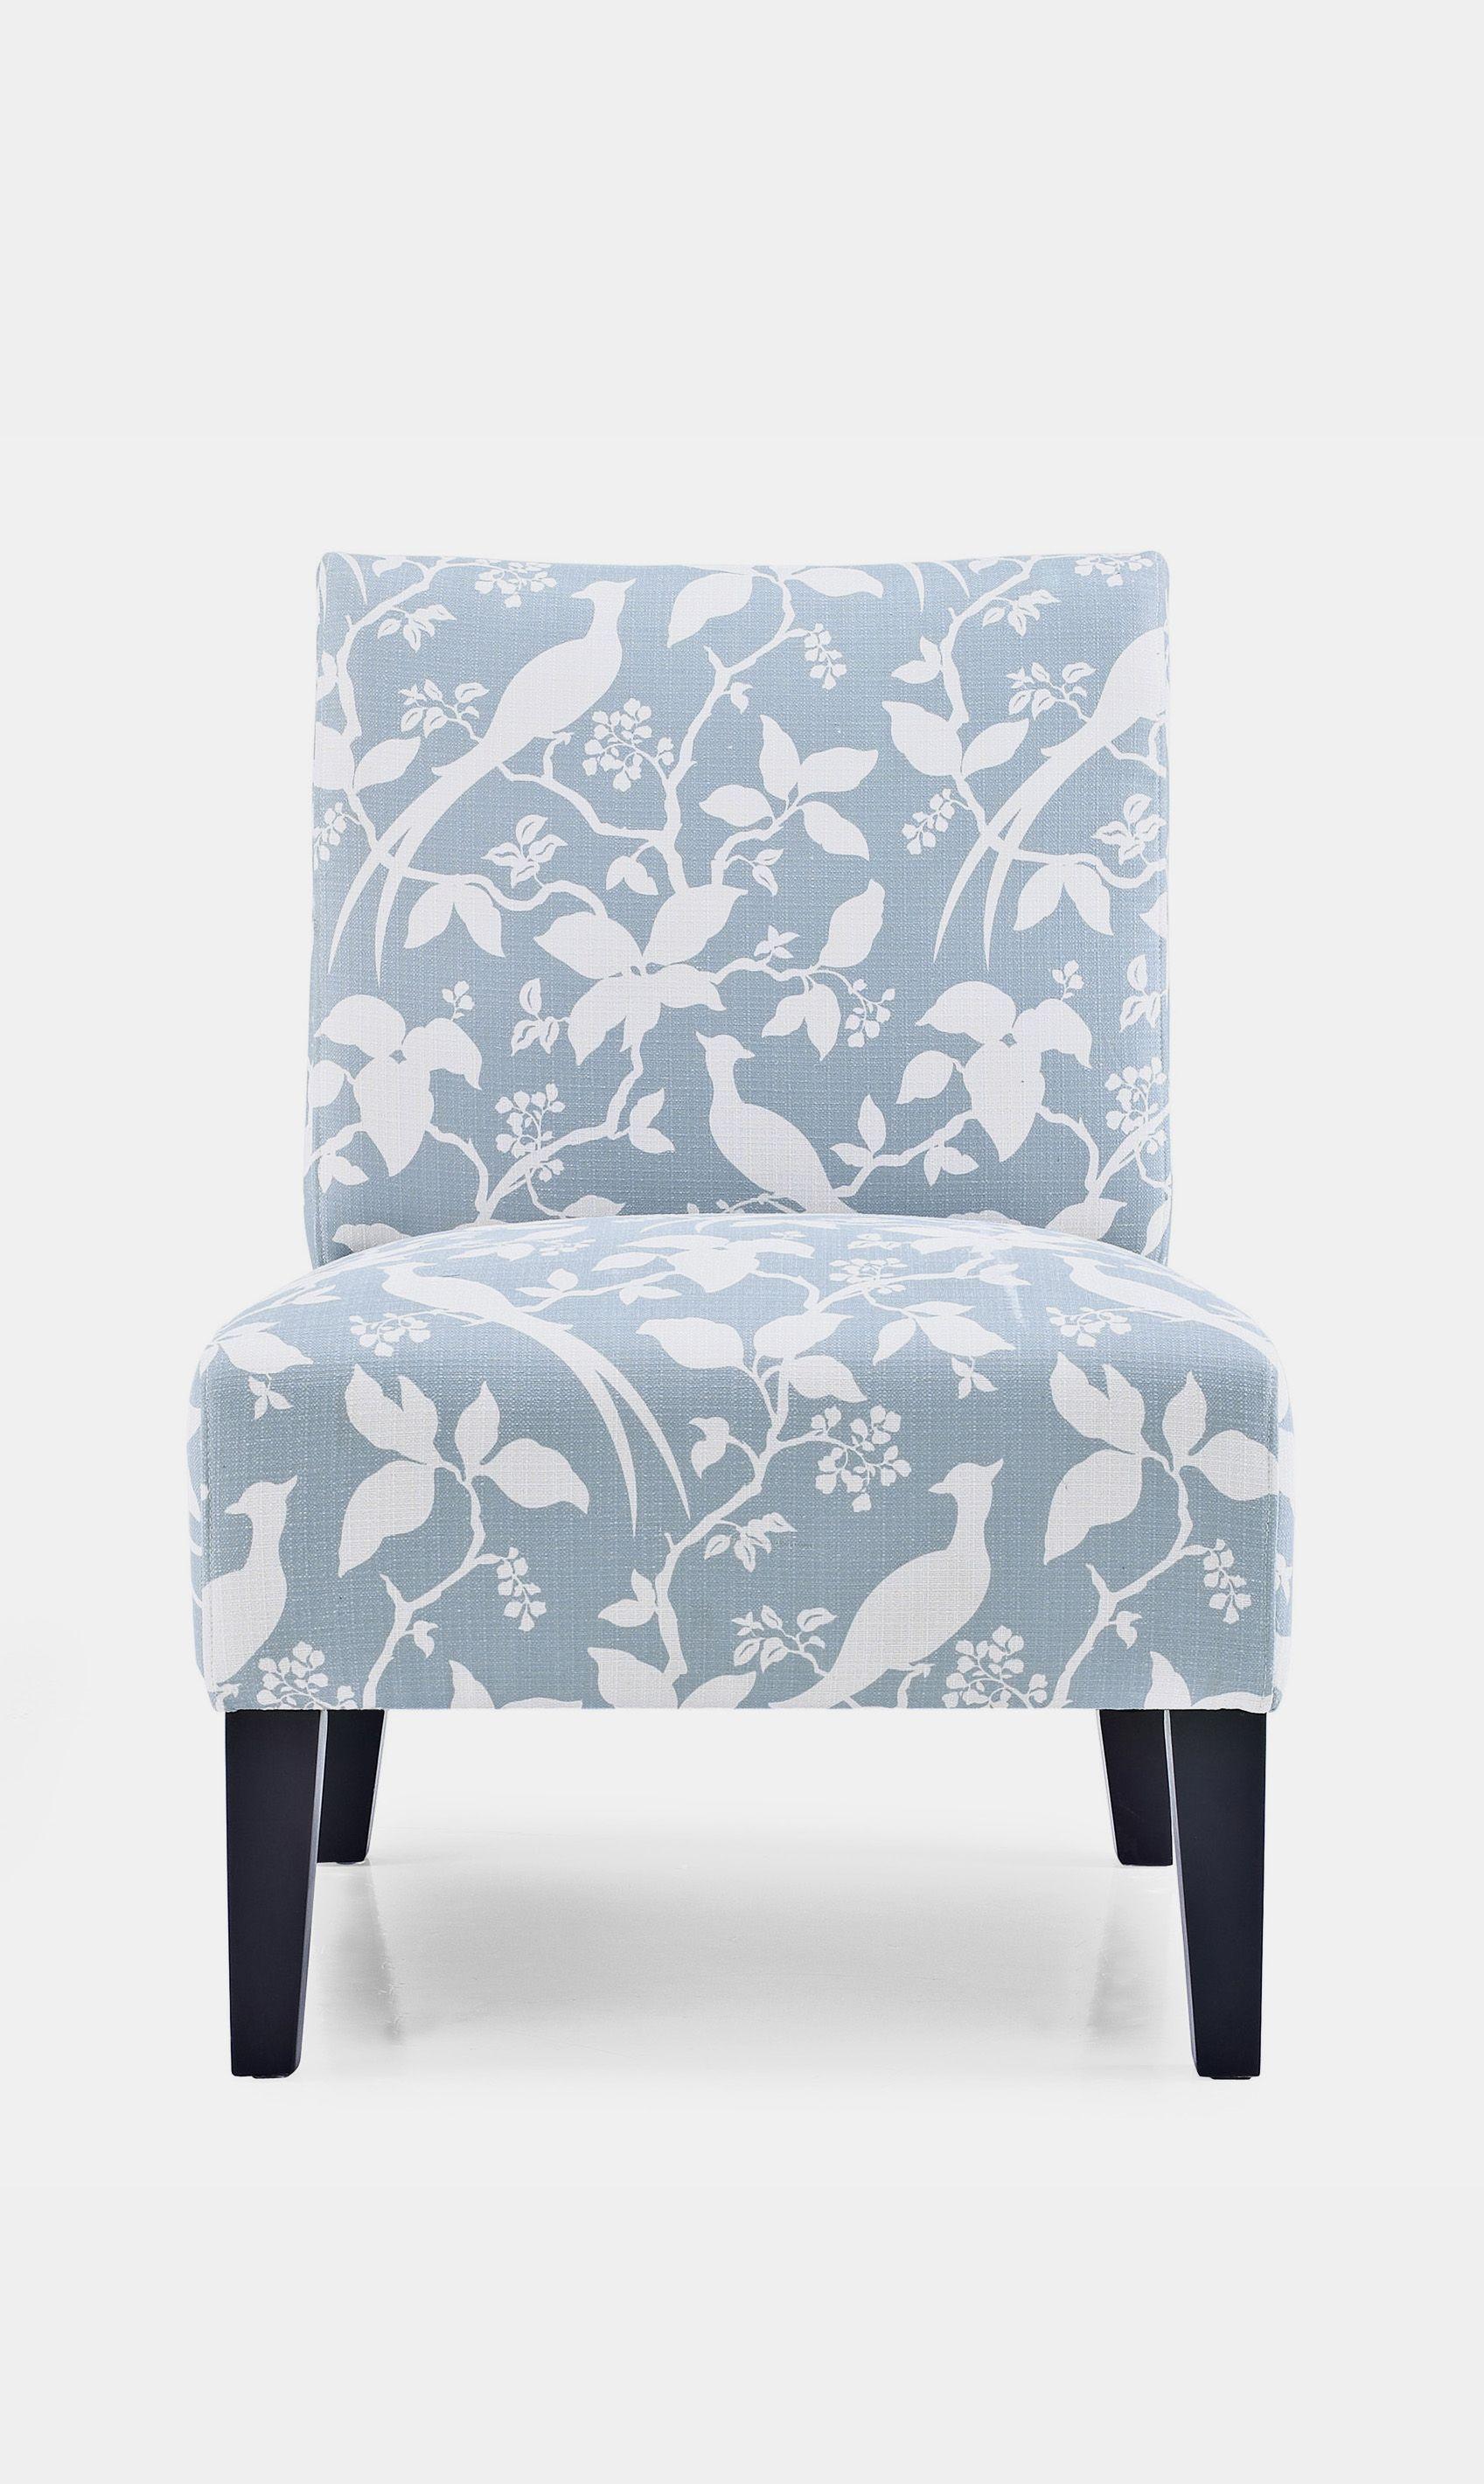 Dhi Monaco Bardot Slipper Chair Muebles Sillas Y Butacas